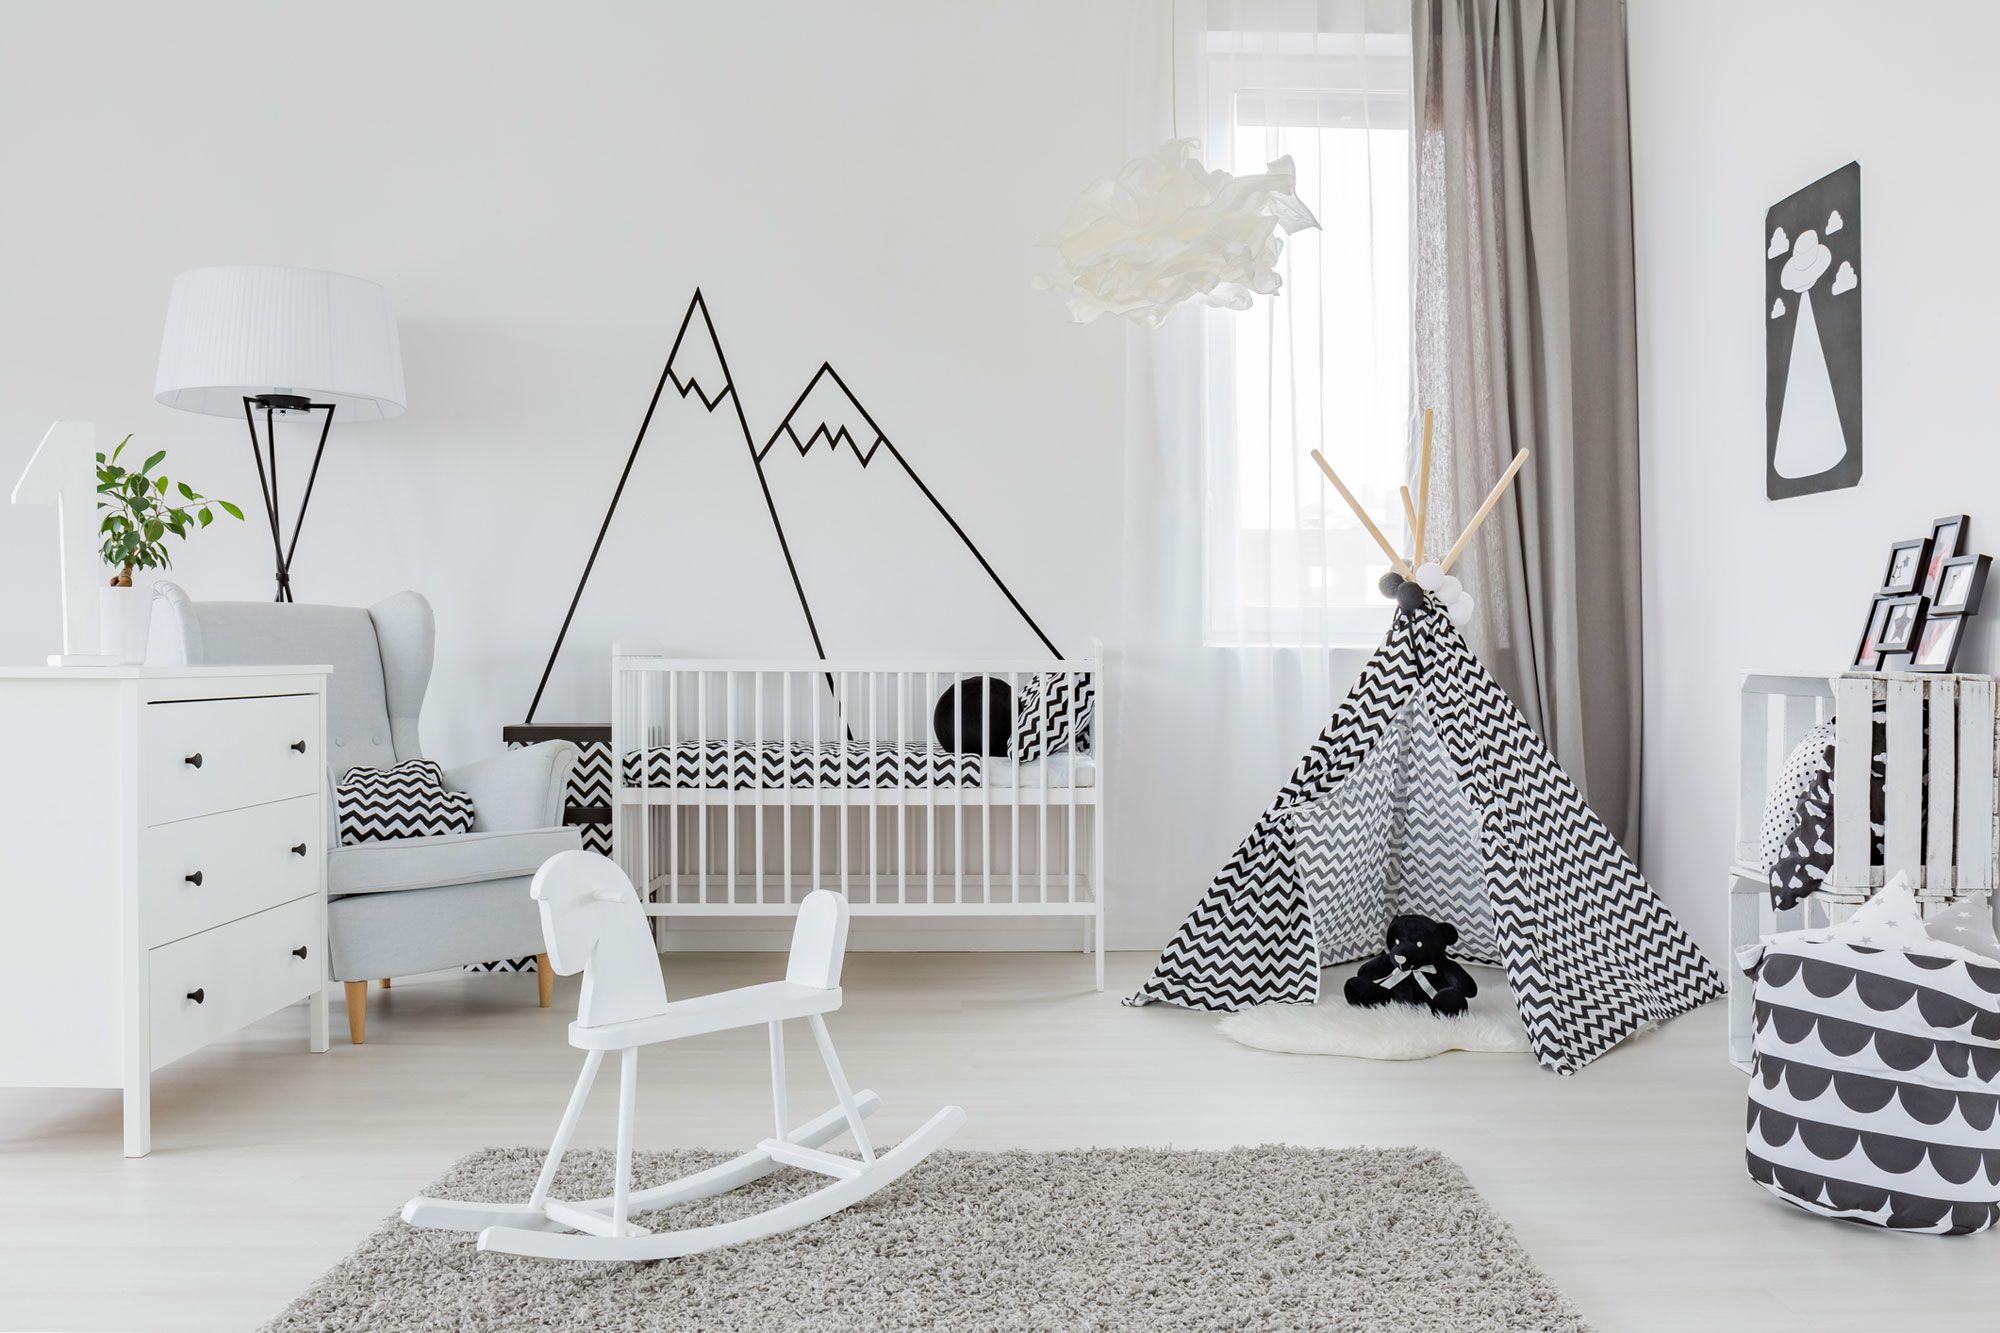 decoraci n infantil minimalista en blanco y negro hogarmania. Black Bedroom Furniture Sets. Home Design Ideas